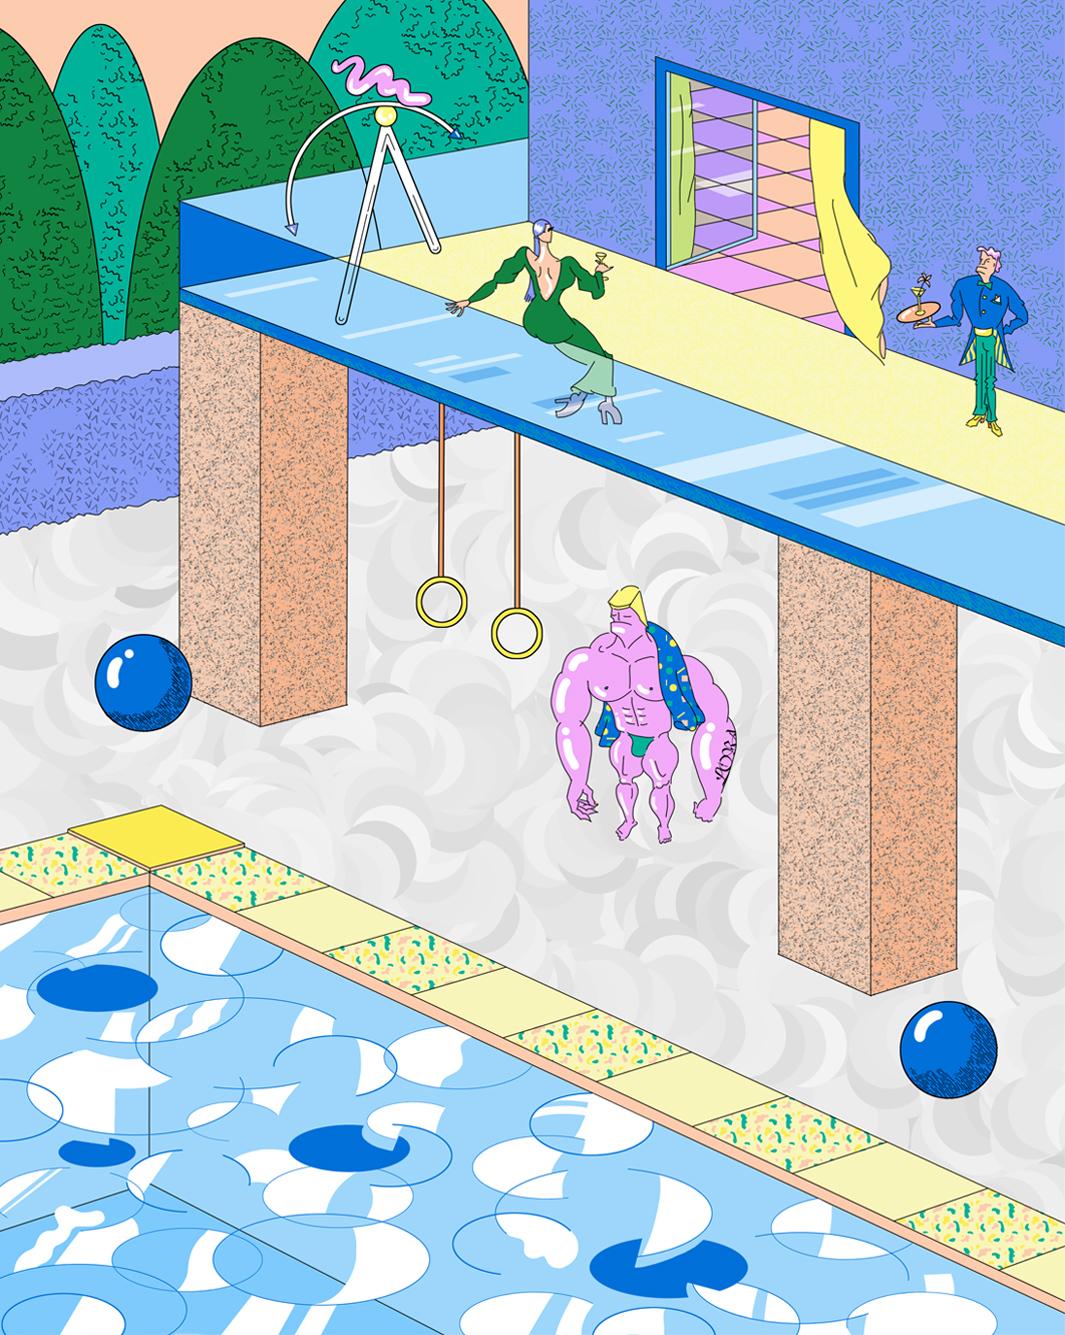 Illustrations #7